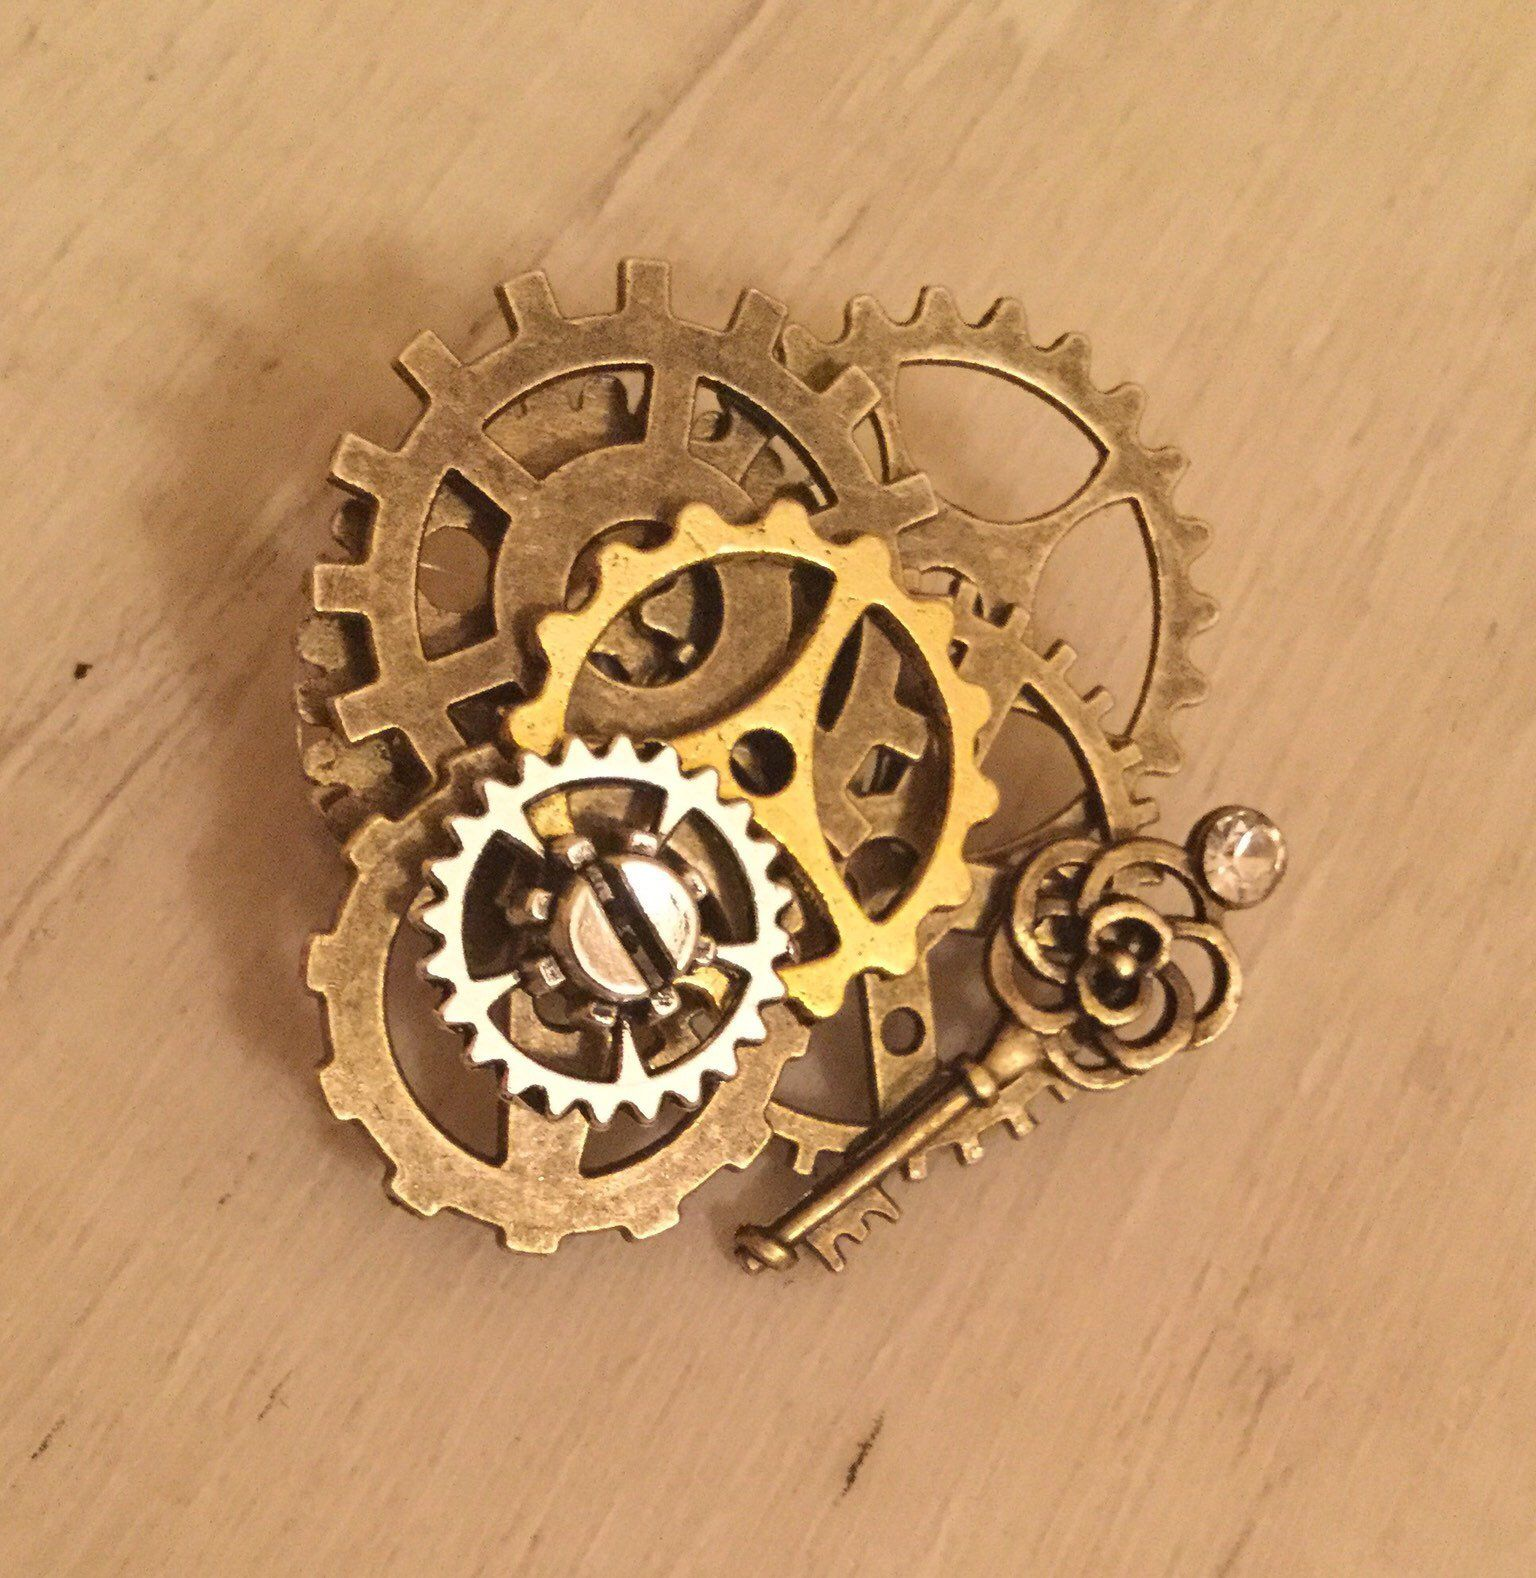 14 Gear SteamPunk Pin   Etsy